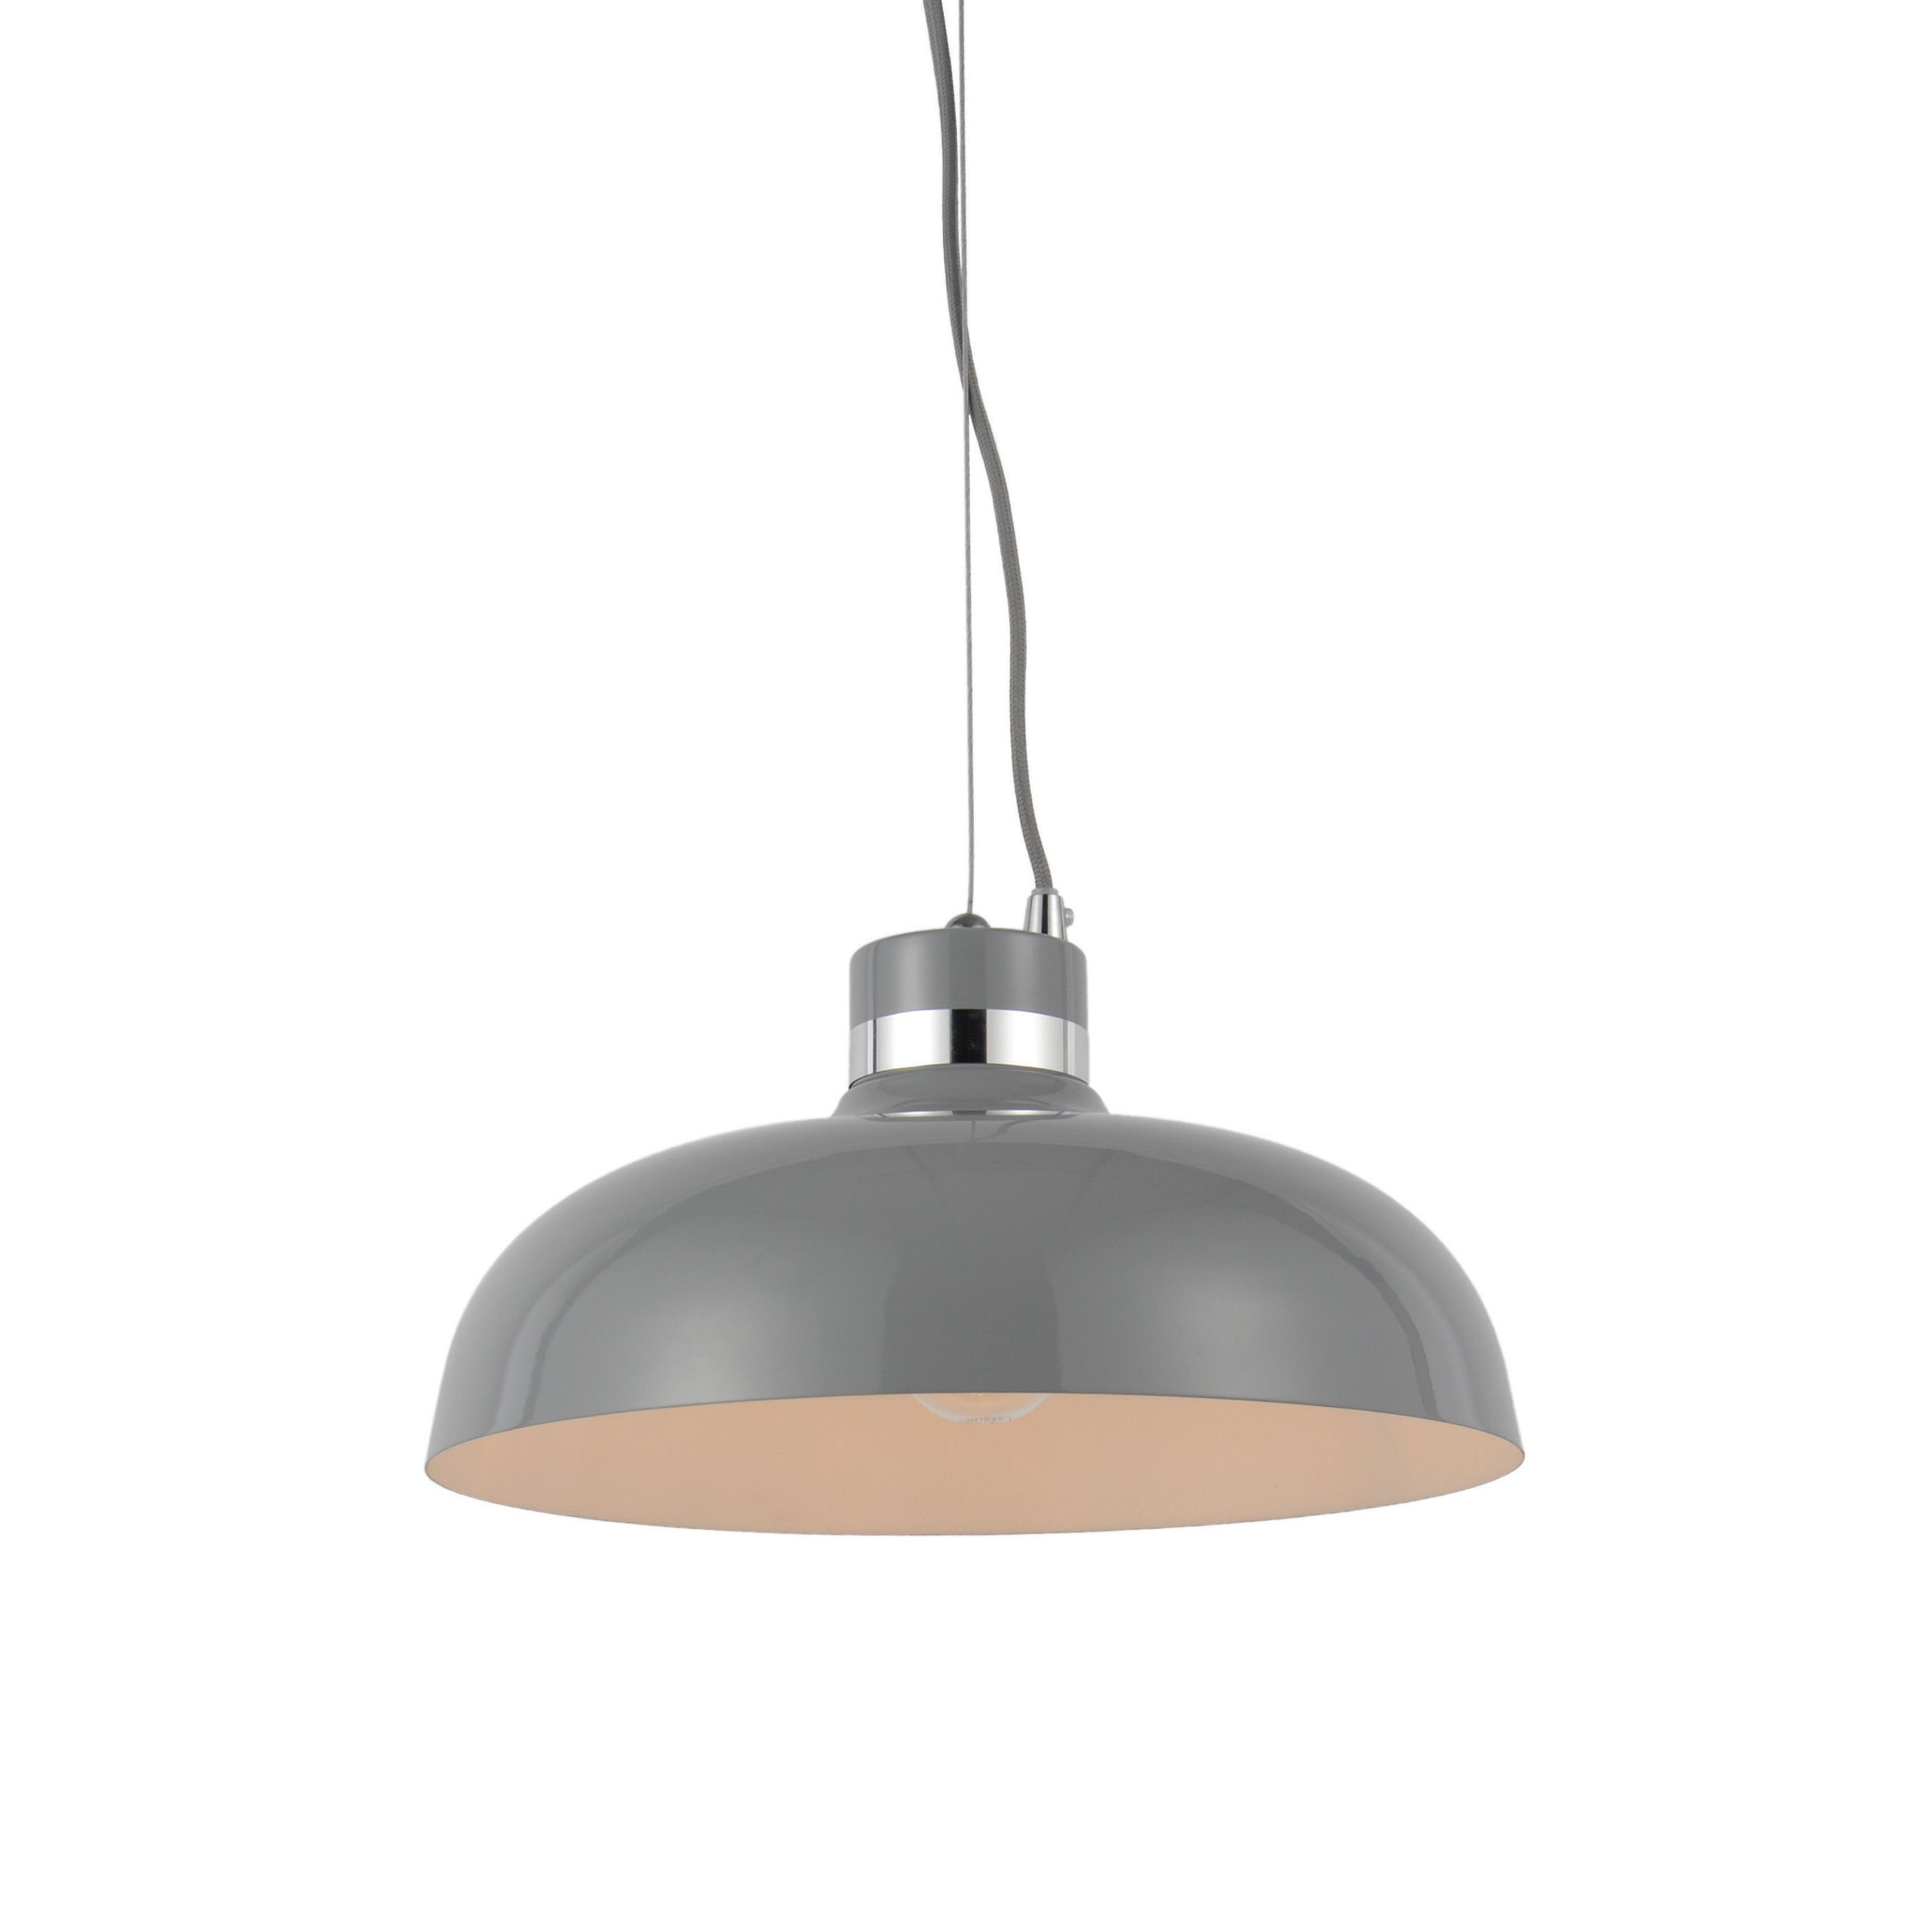 B And Q Kitchen Lights Holman grey pendant ceiling light ceiling lights ceilings and lights b and q light workwithnaturefo